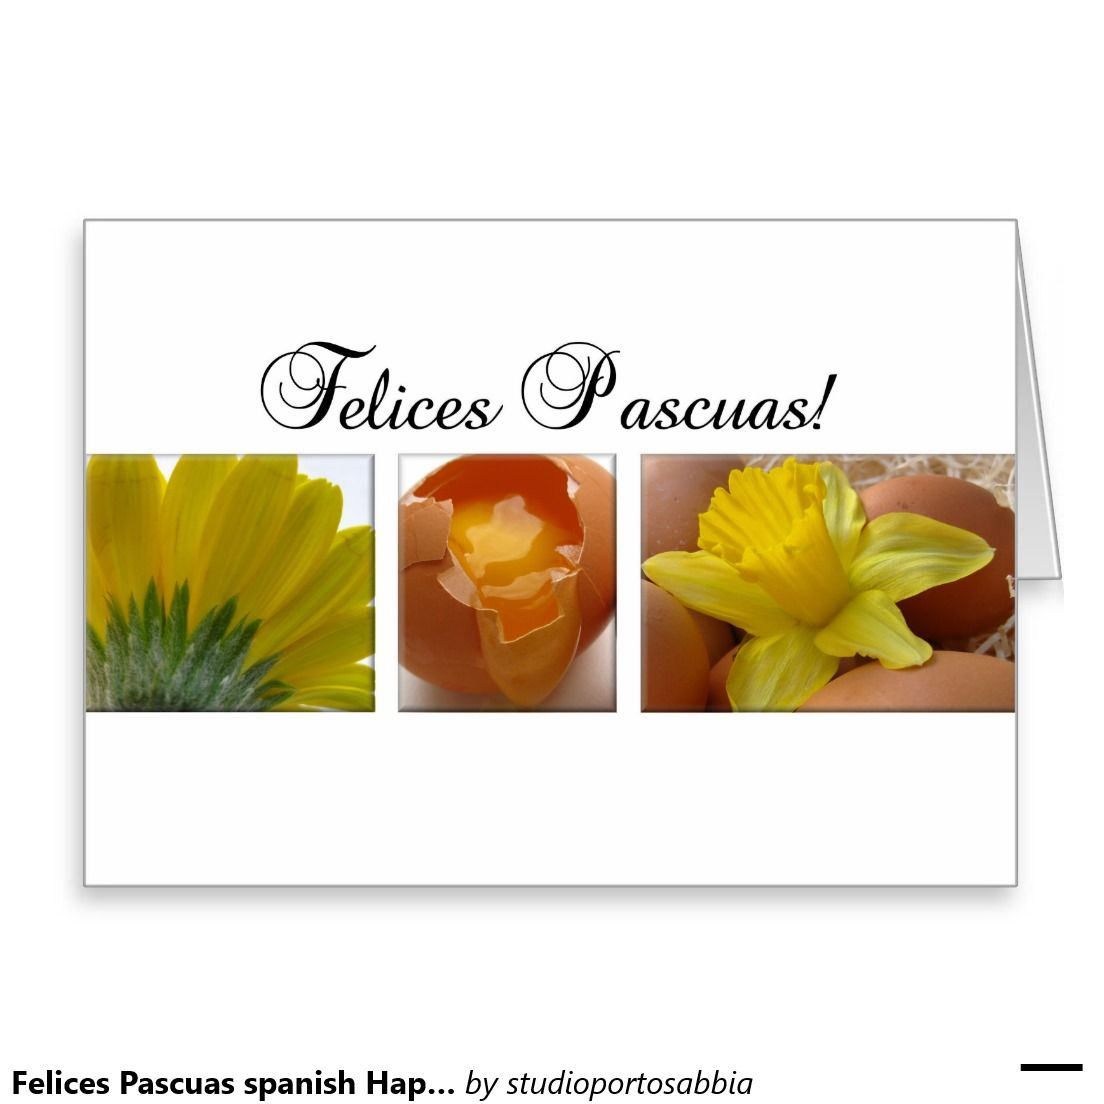 Felices pascuas spanish happy easter stationery note card shared felices pascuas spanish happy easter stationery note card m4hsunfo